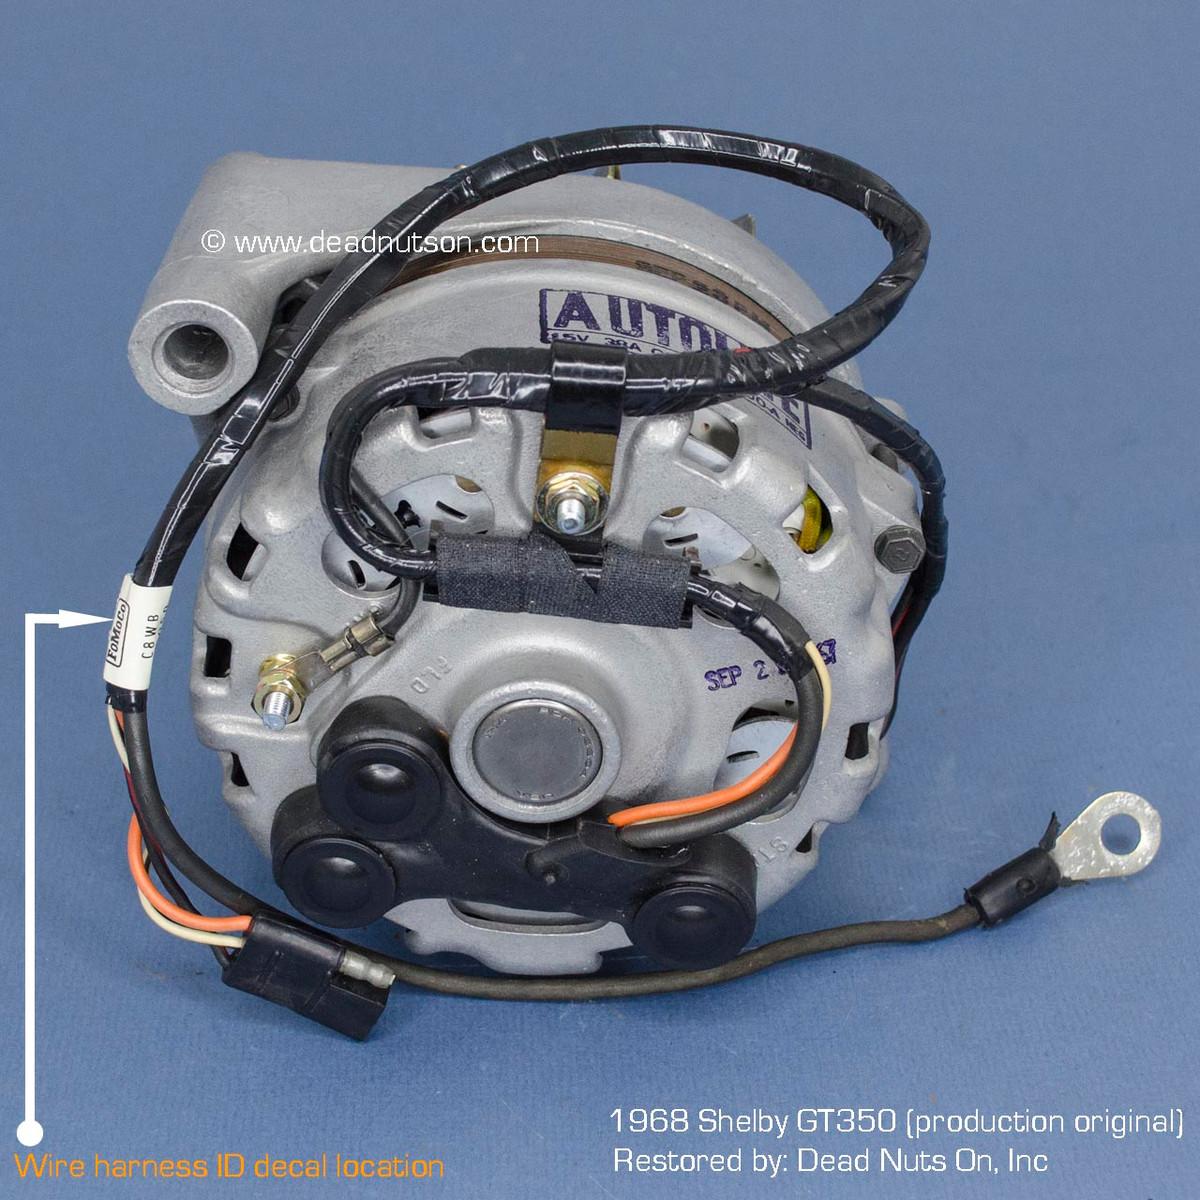 vw alternator wiring harness, toyota alternator wiring harness, ford  alternator wiring harness, mustang